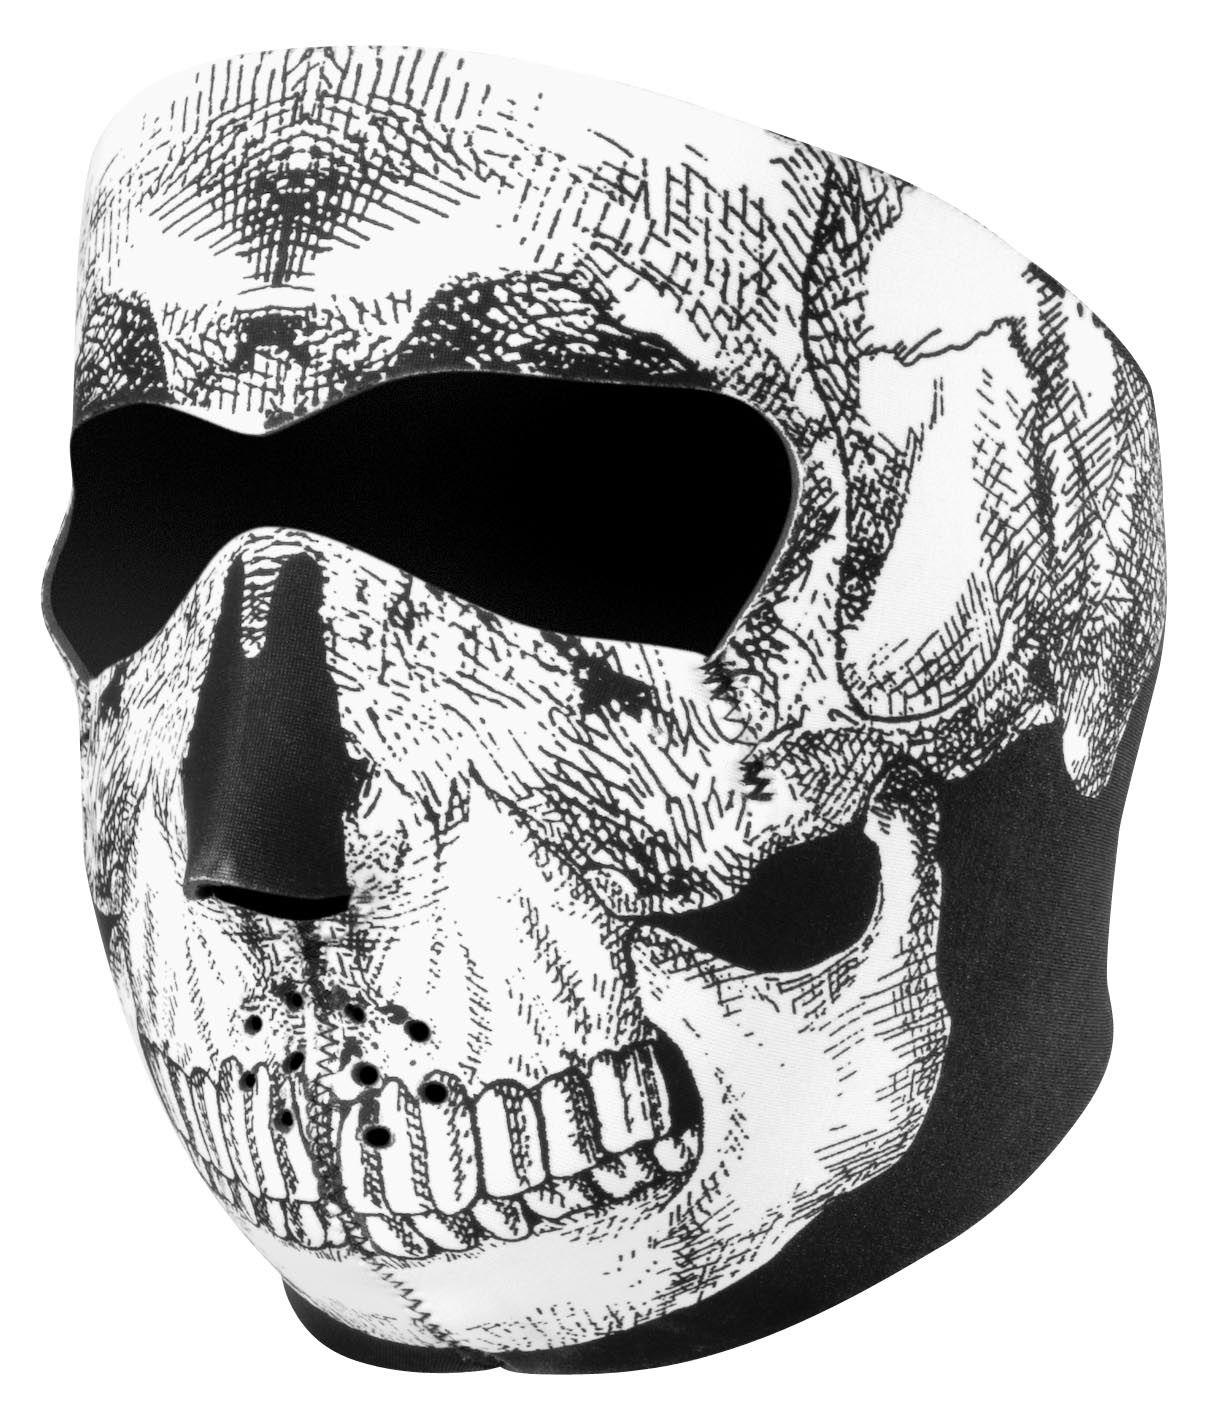 89c68254054 ZANheadgear Skull Neoprene Full Face Mask - Cycle Gear